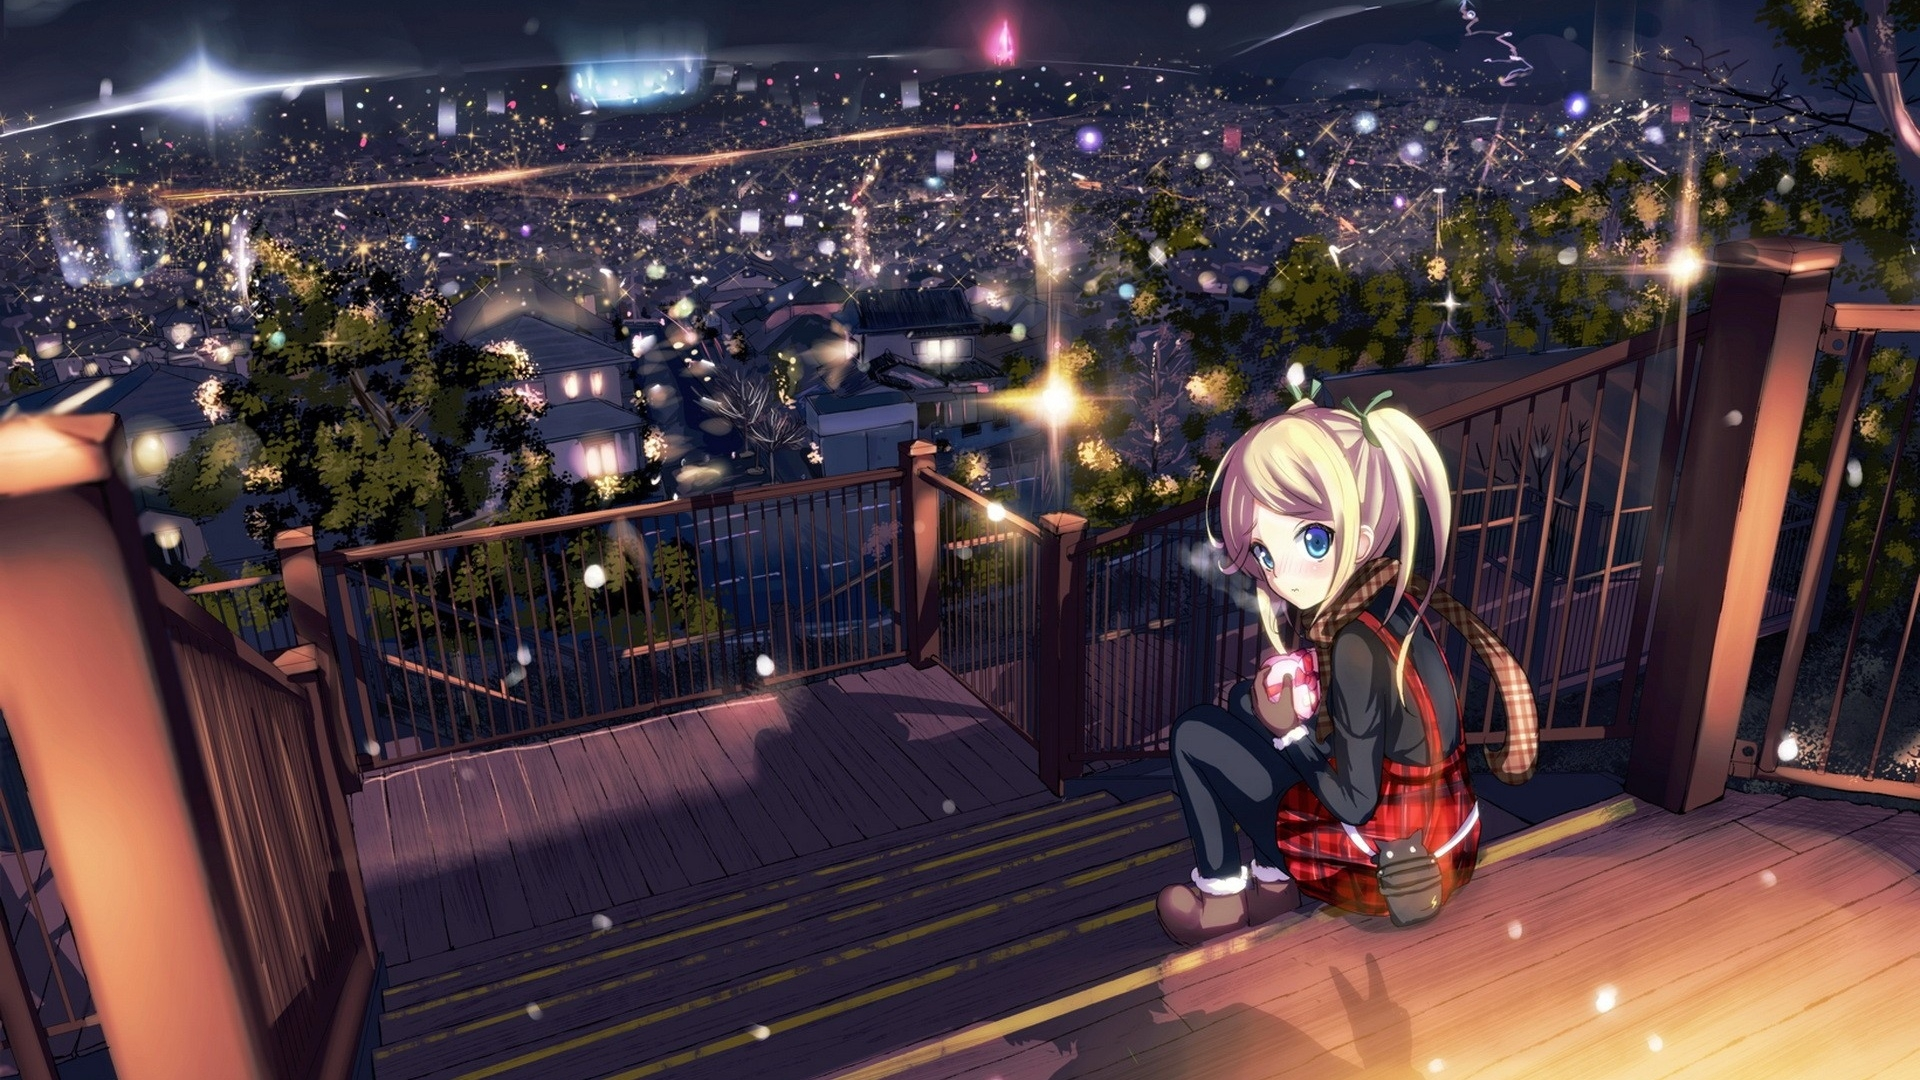 Blue Anime Landscape Wallpaper